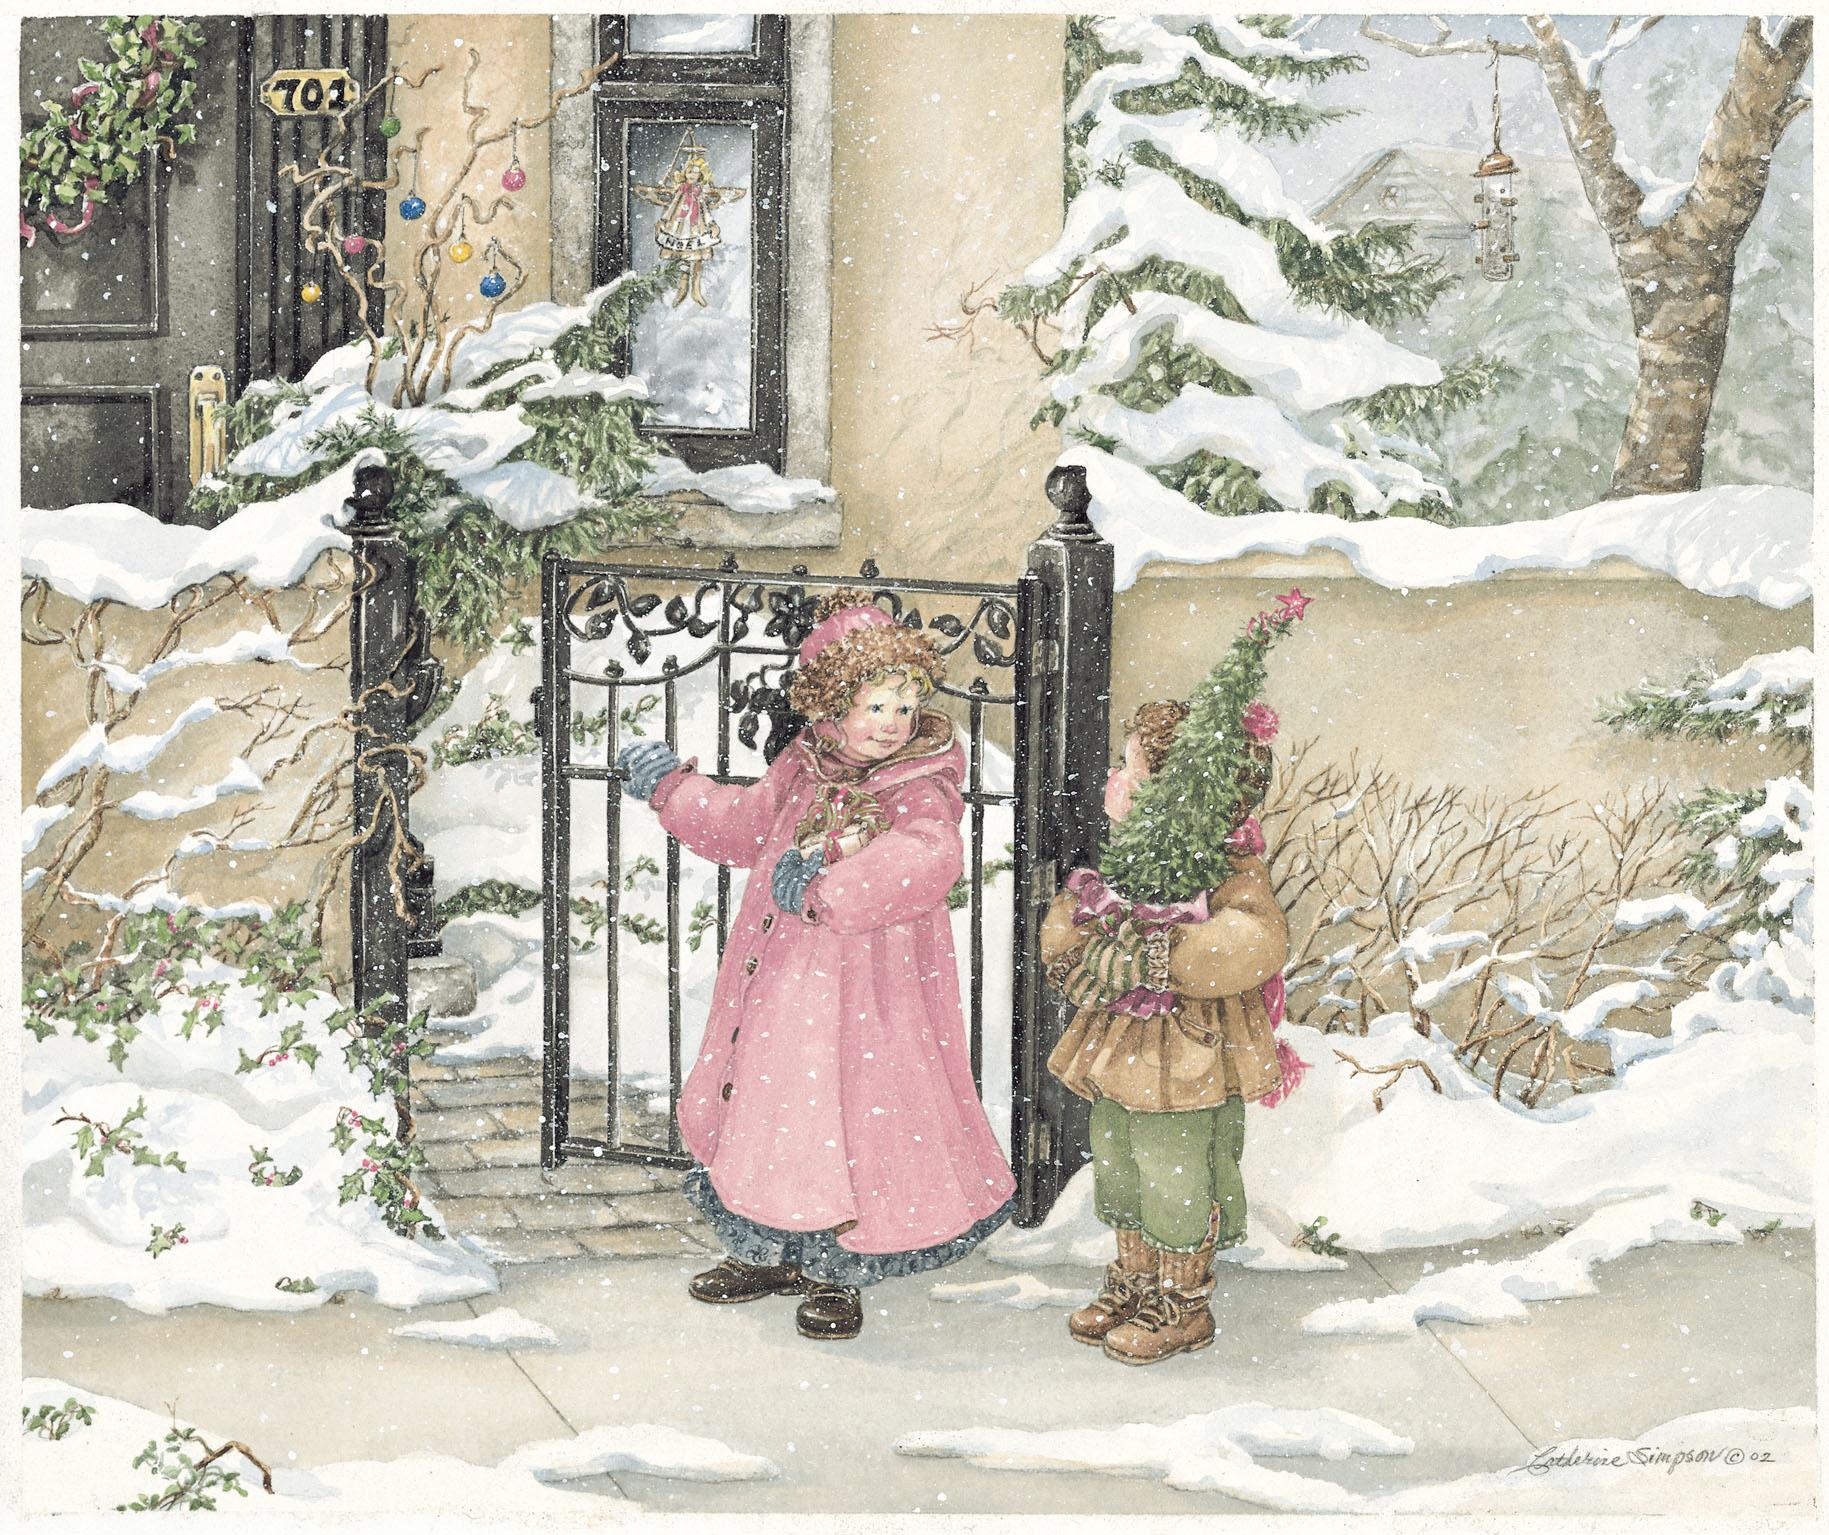 Gramma's Christmas by Catherine Simpson